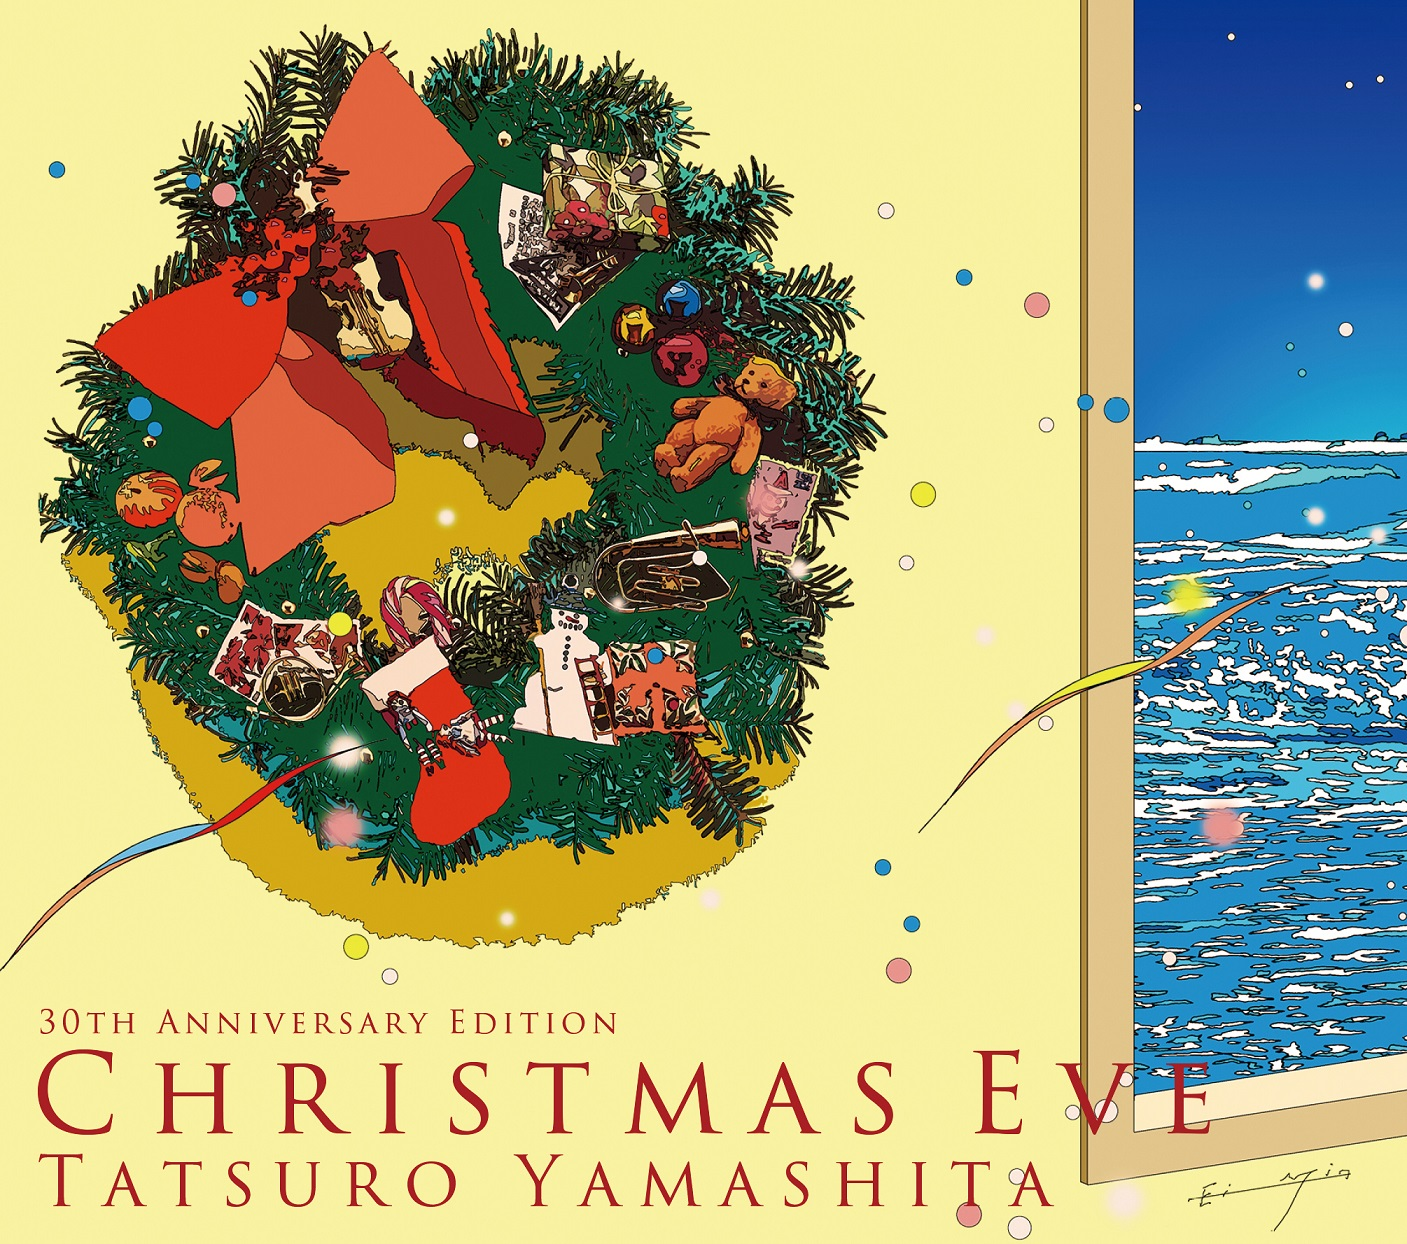 ChristmasEve2017表1-1